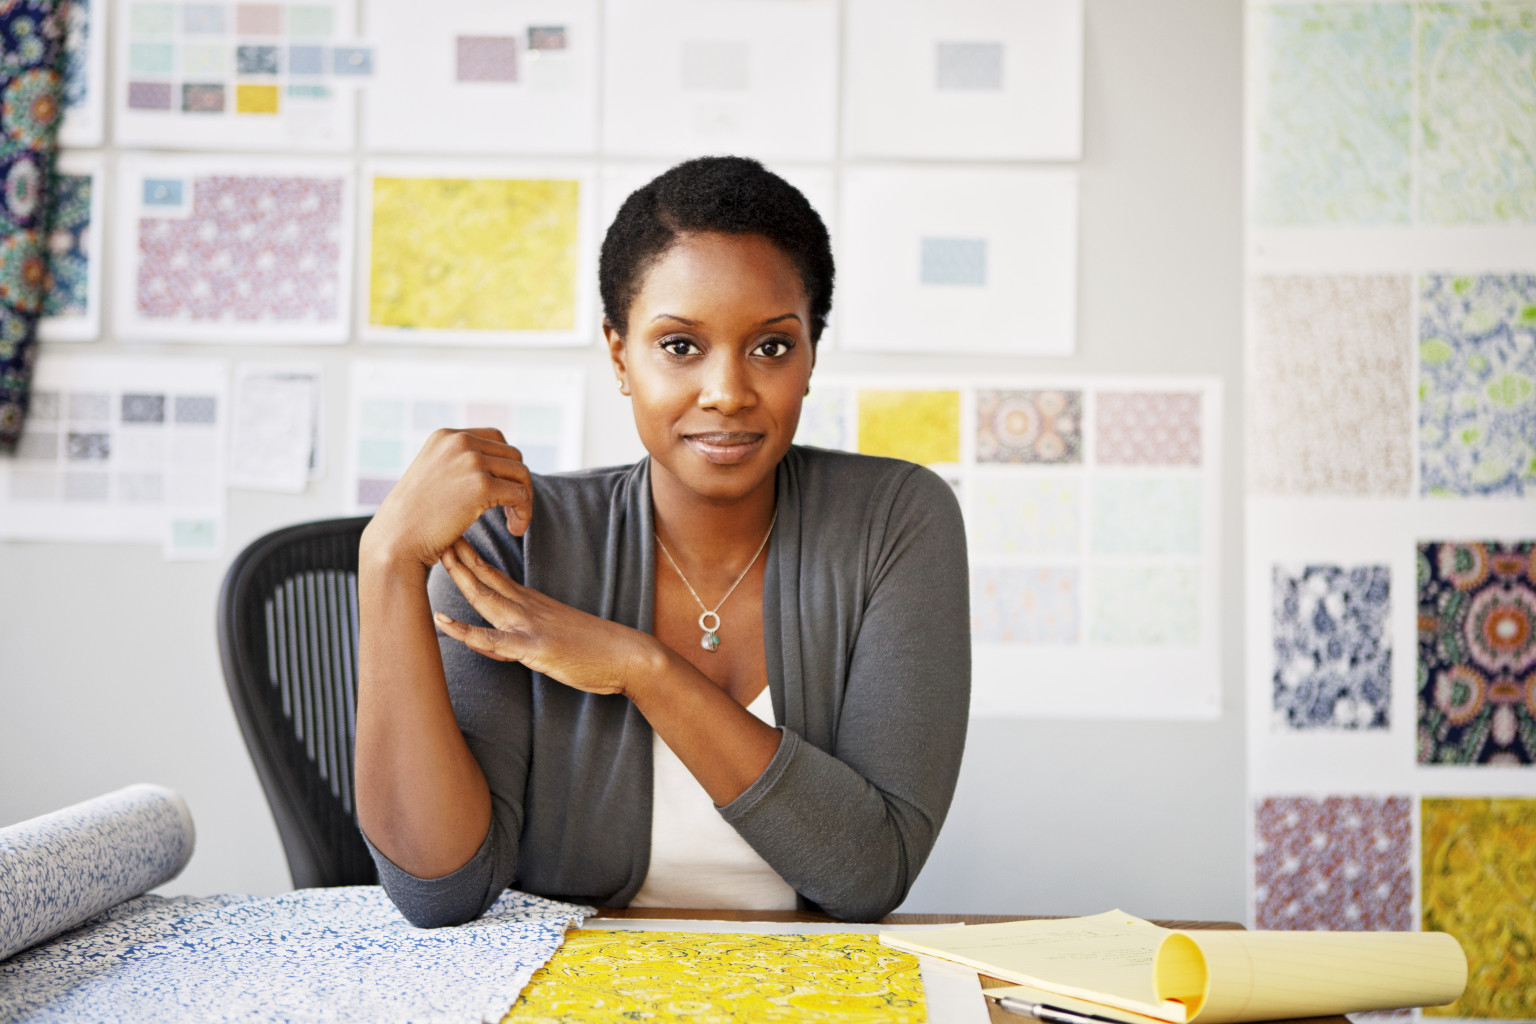 women enterpreneur Women's entrepreneurship: issues and policies executive summary women's entrepreneurship needs to be studied separately for two main reasons.